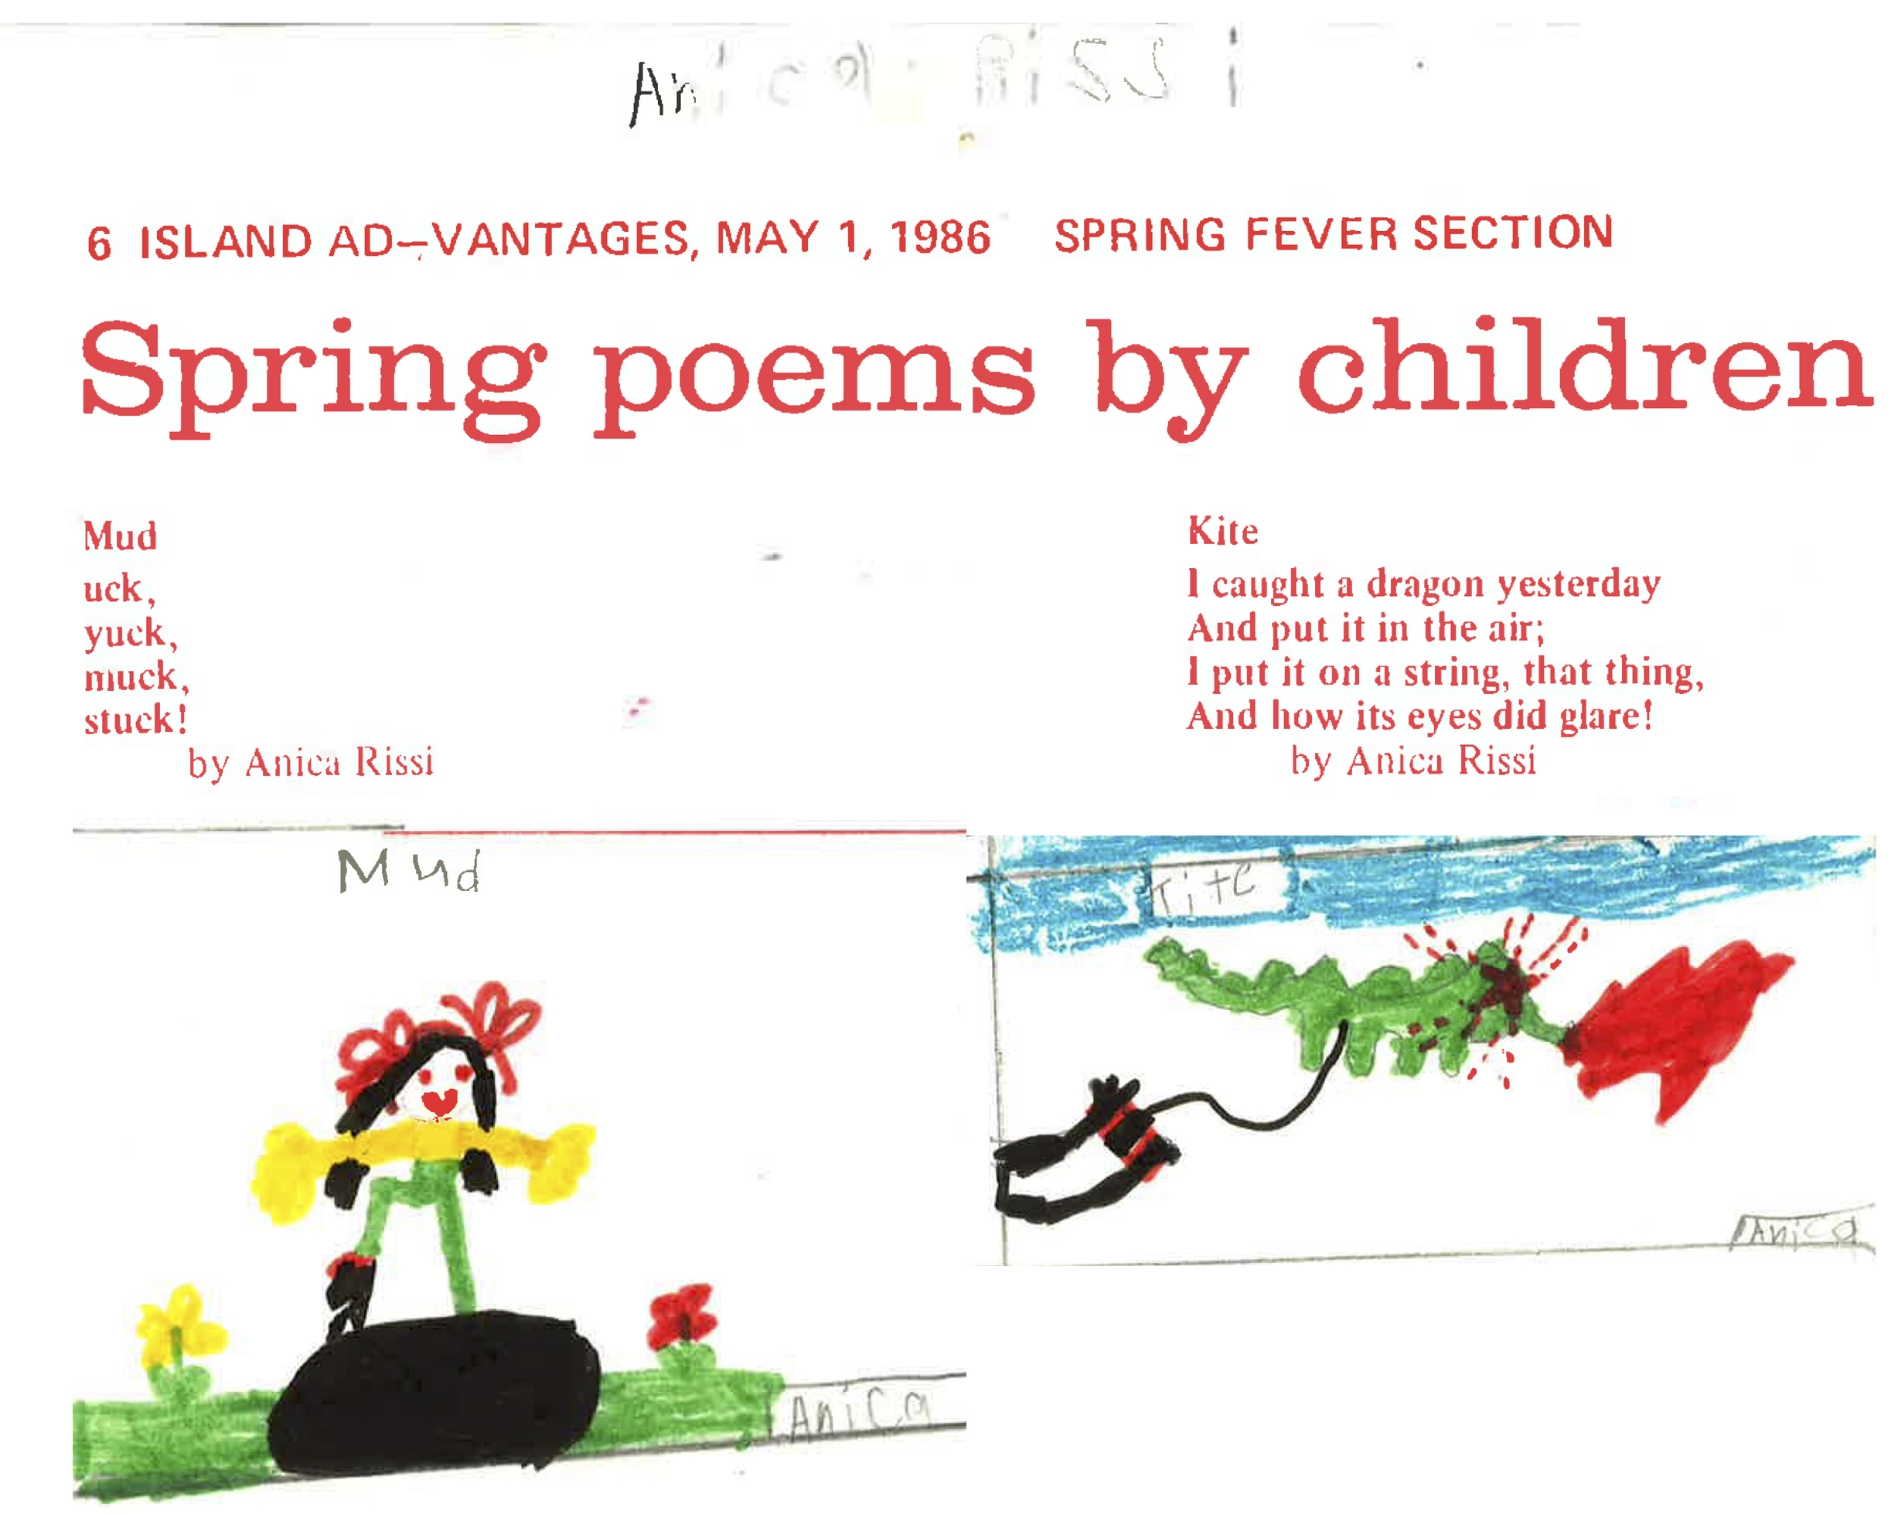 poemsbyAnicaMroseRissi.jpg